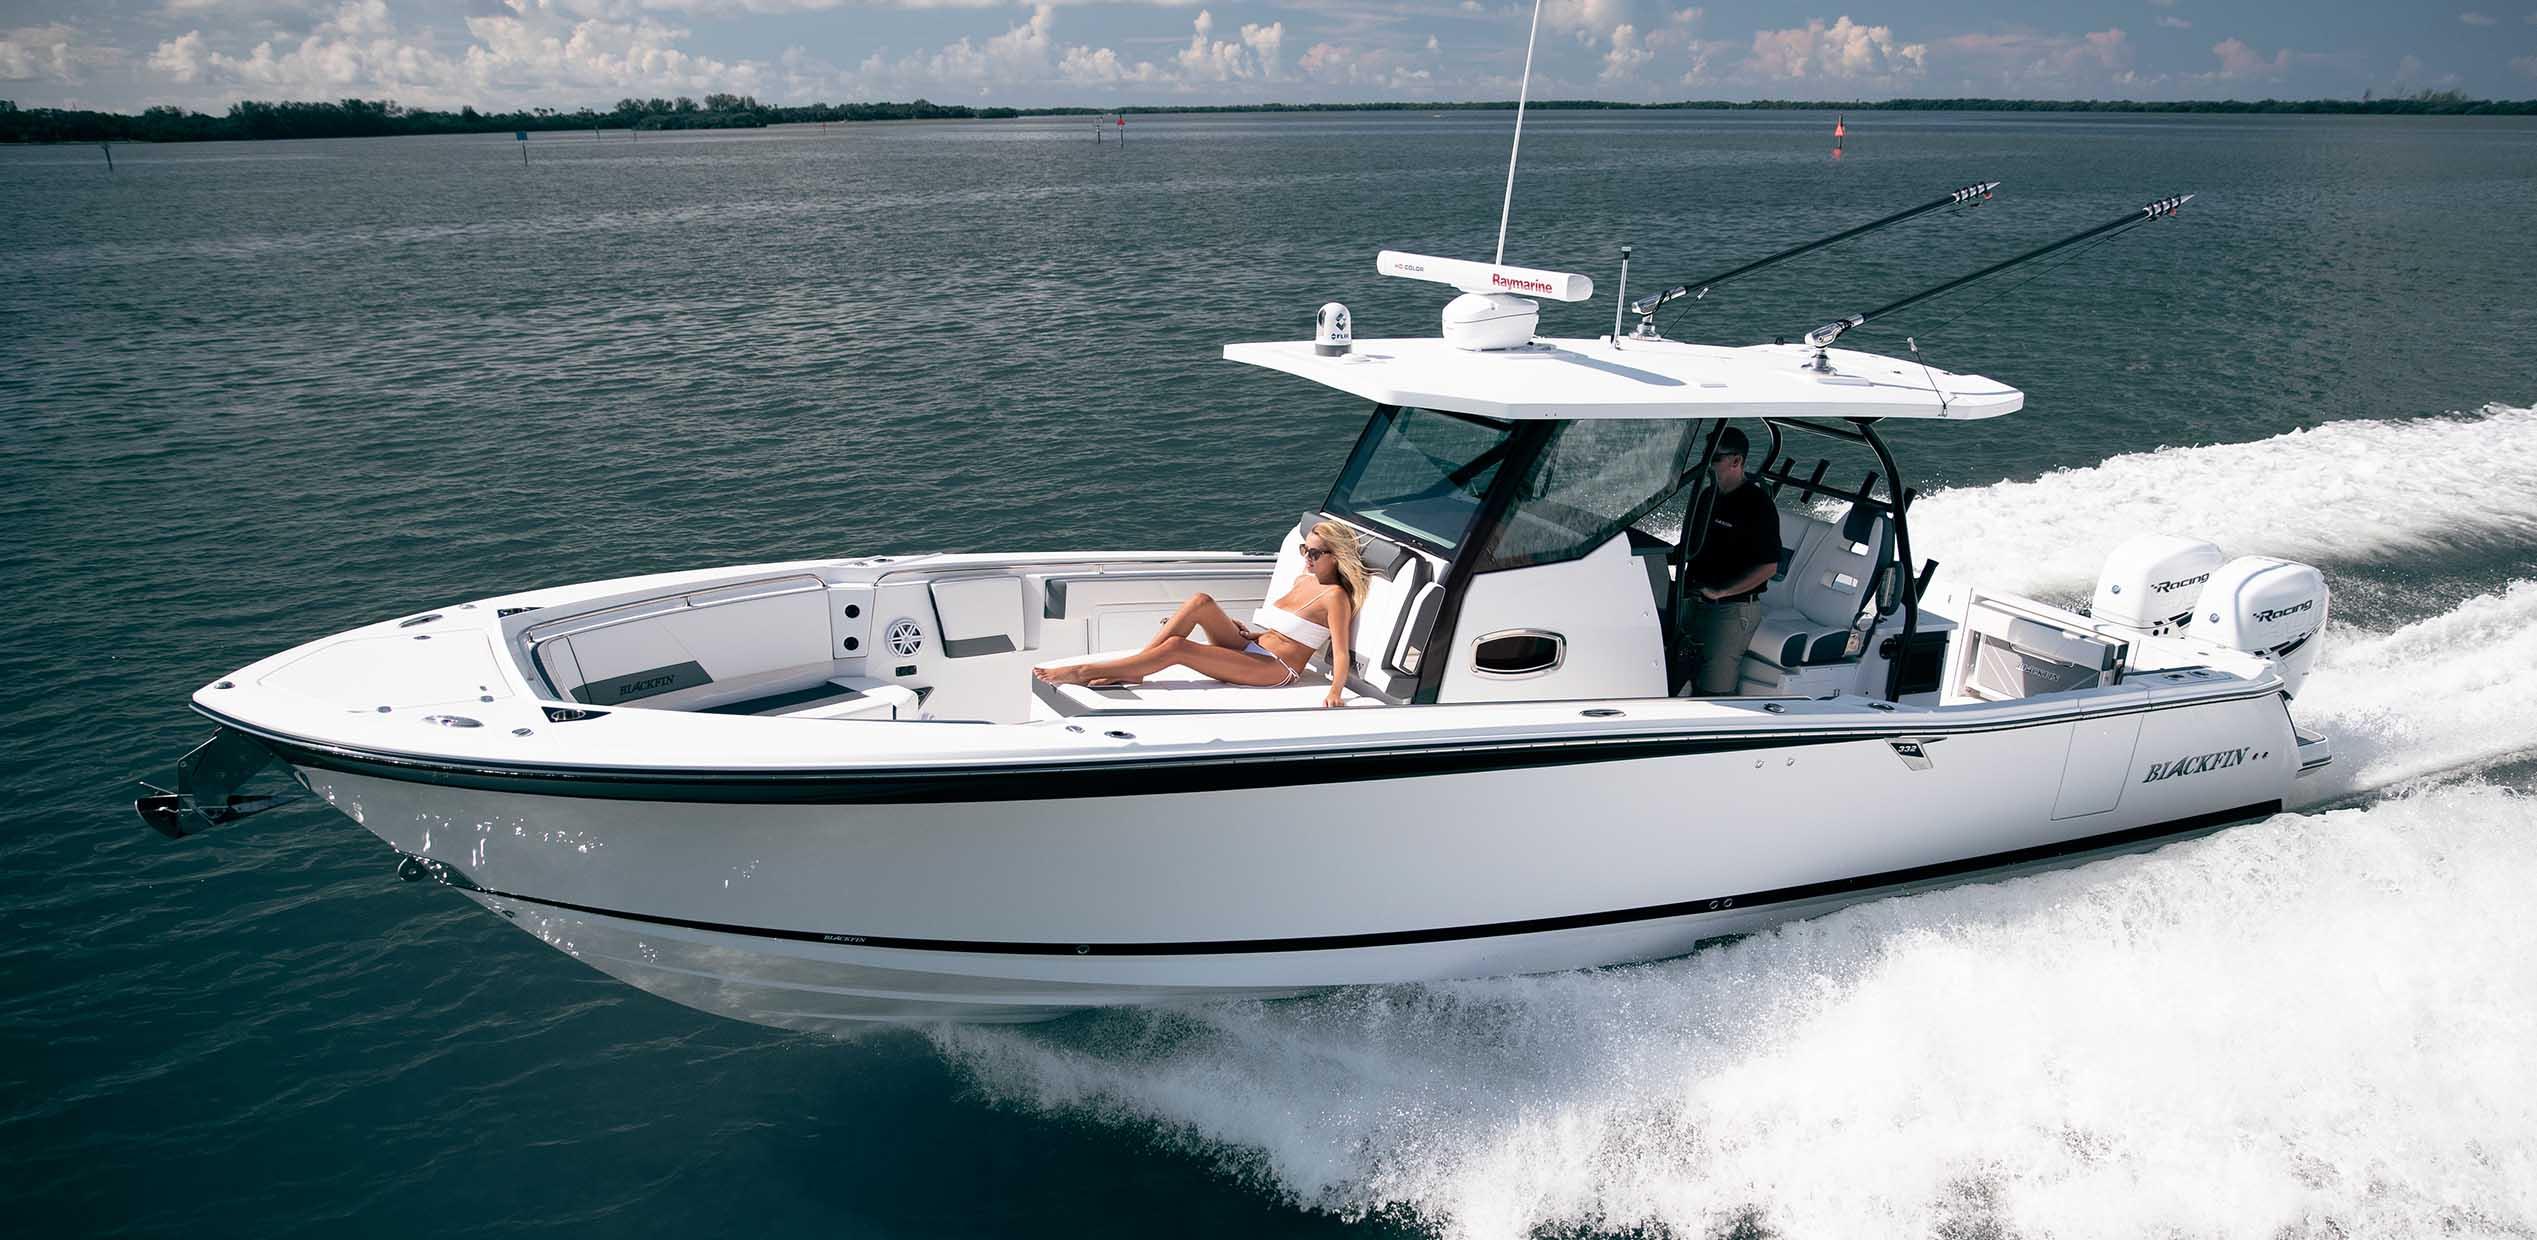 Blackfin Boats Boats For Sale Miami Amp Palm Beach